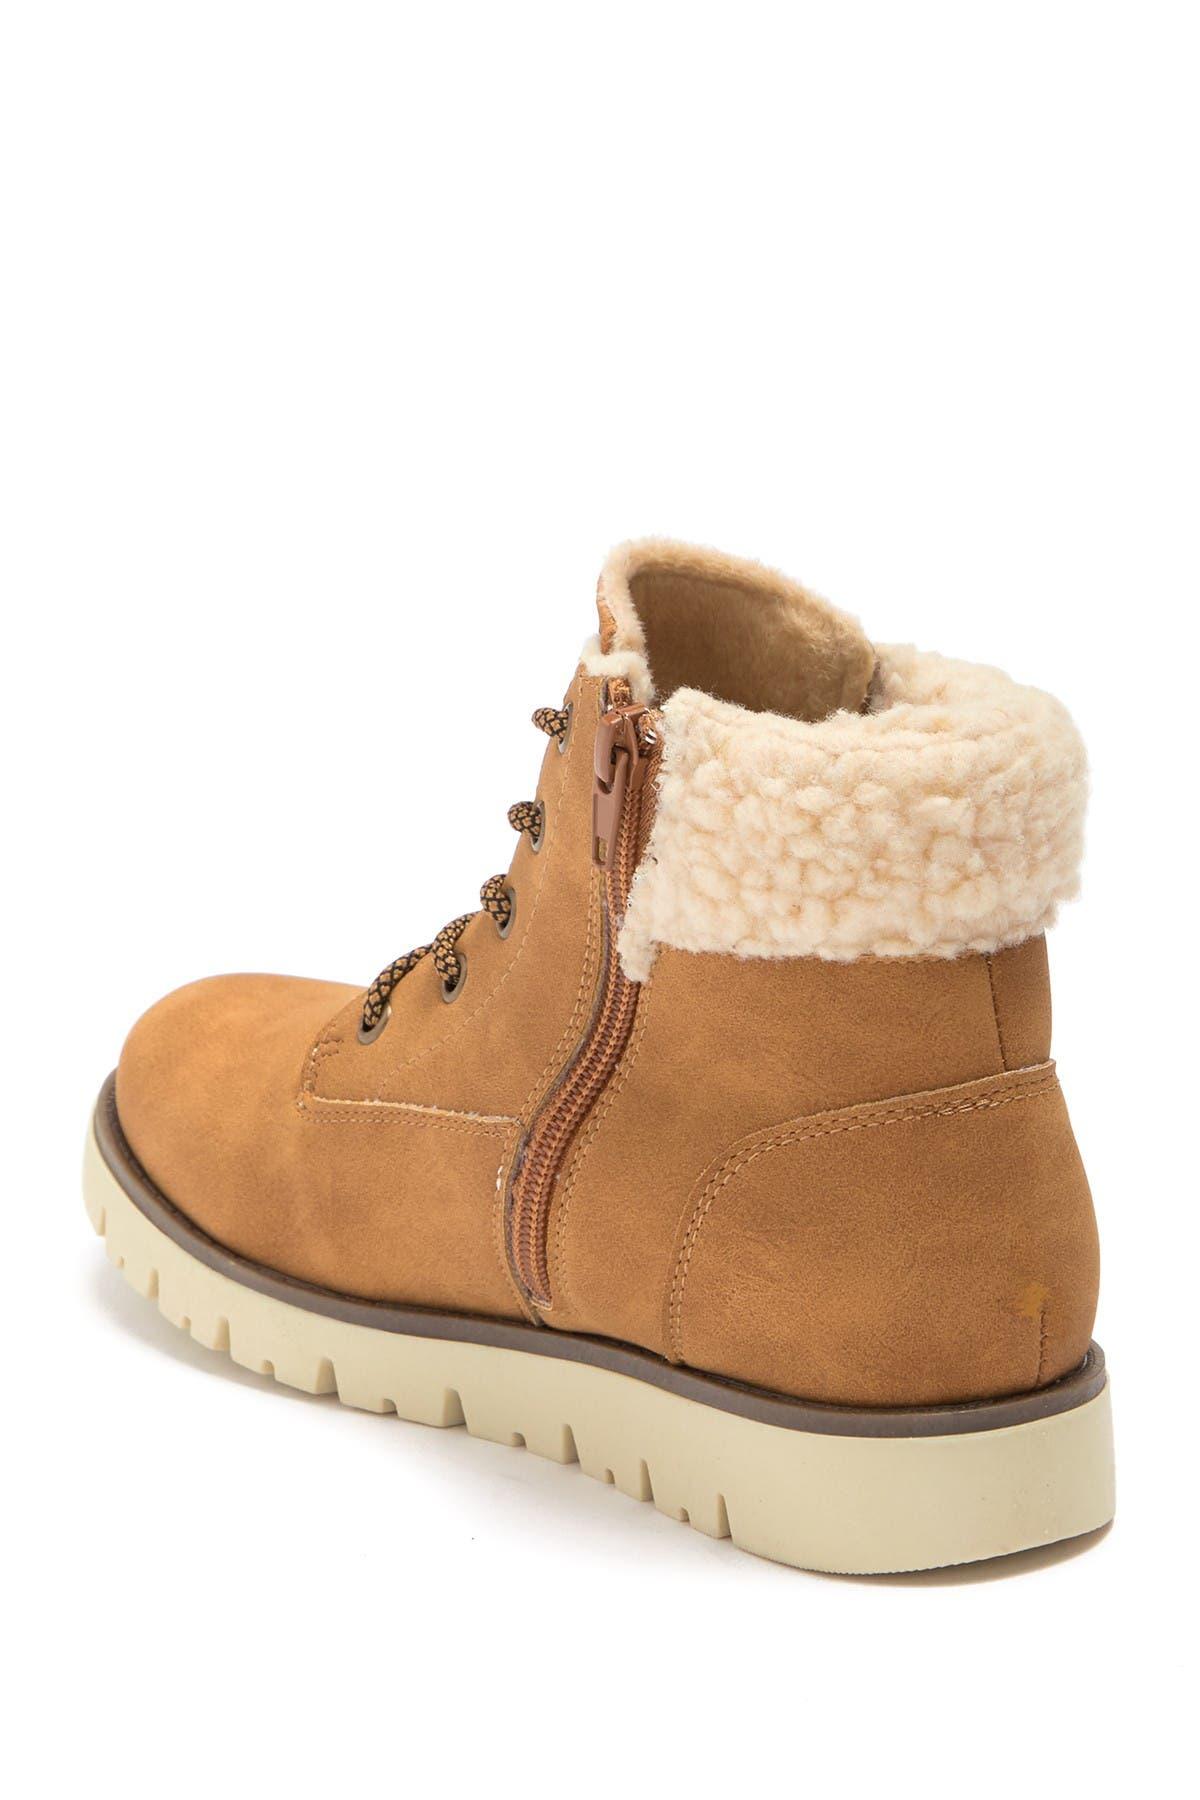 SPROX Alexa Faux Shearling Cuff Boot